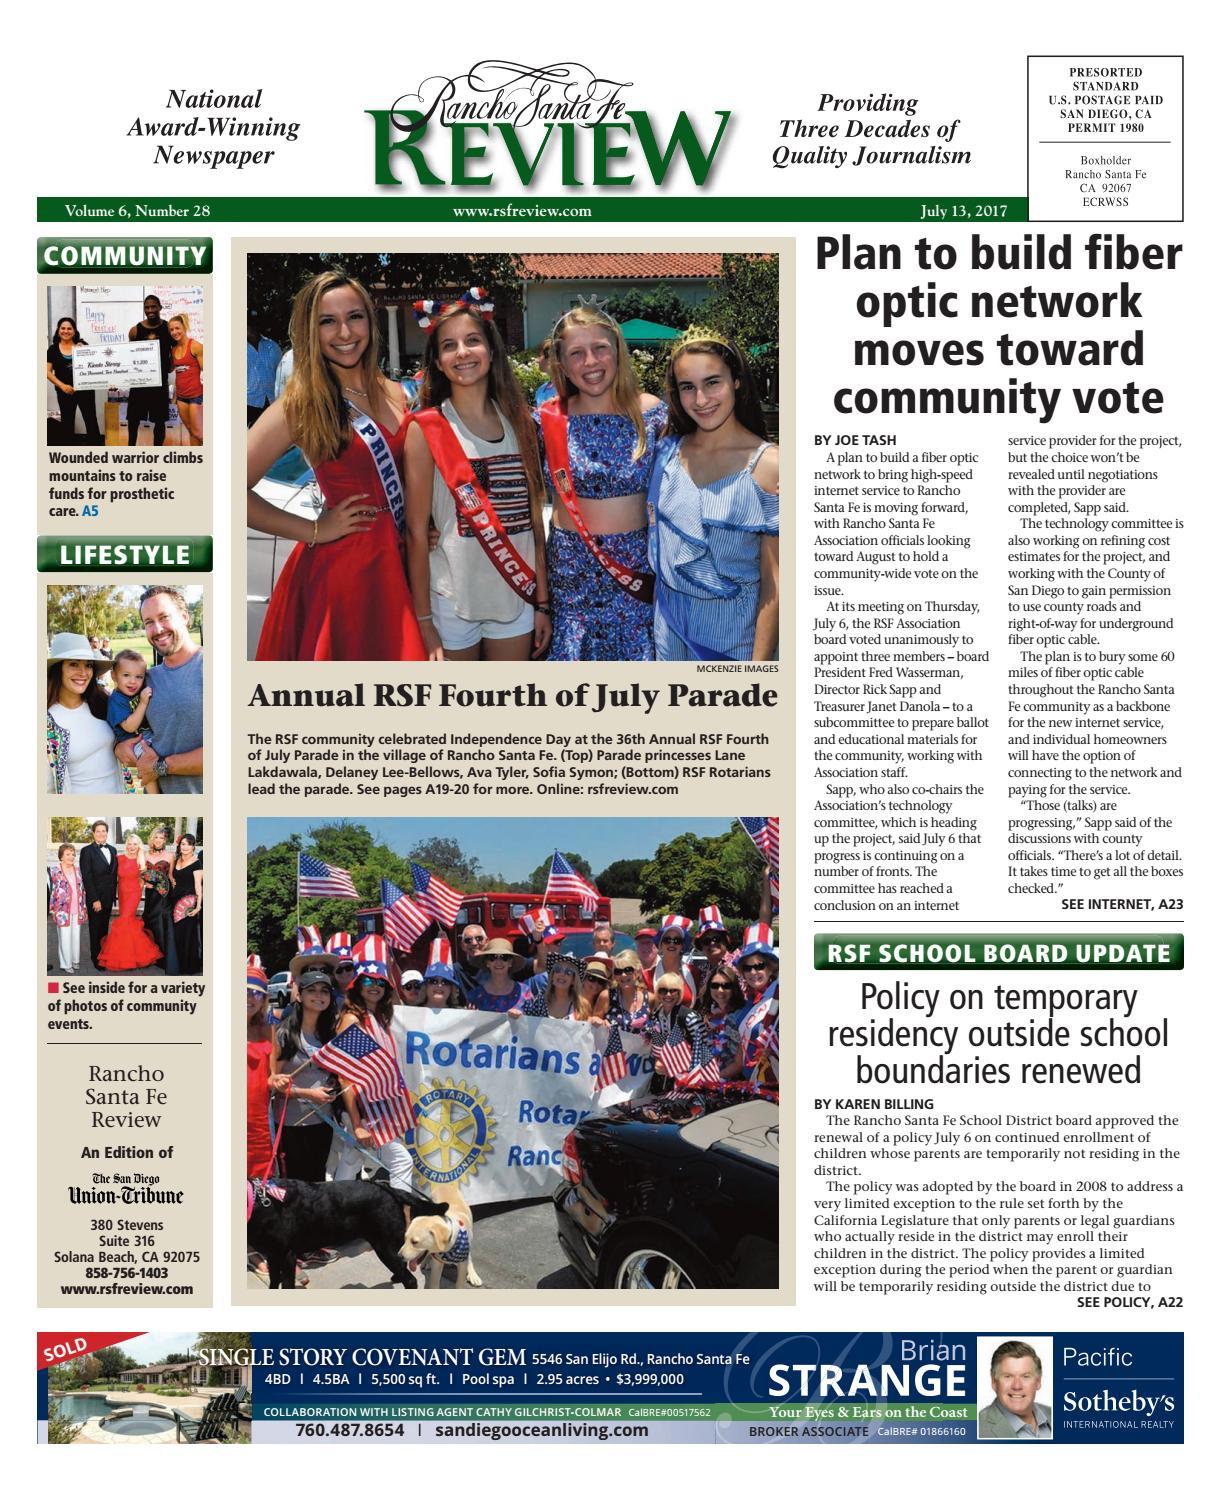 5278427b92 Rancho Santa Fe Review 07.13.17 by MainStreet Media - issuu